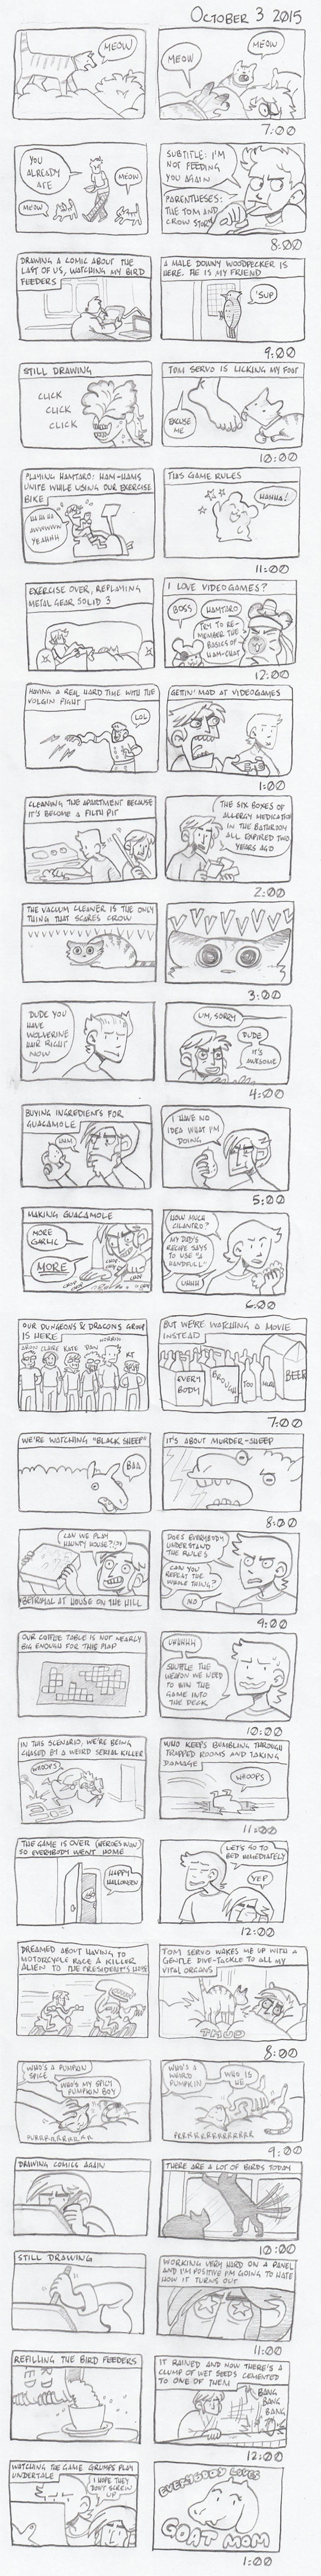 Sunday Comics: Epically Tea-Bagged